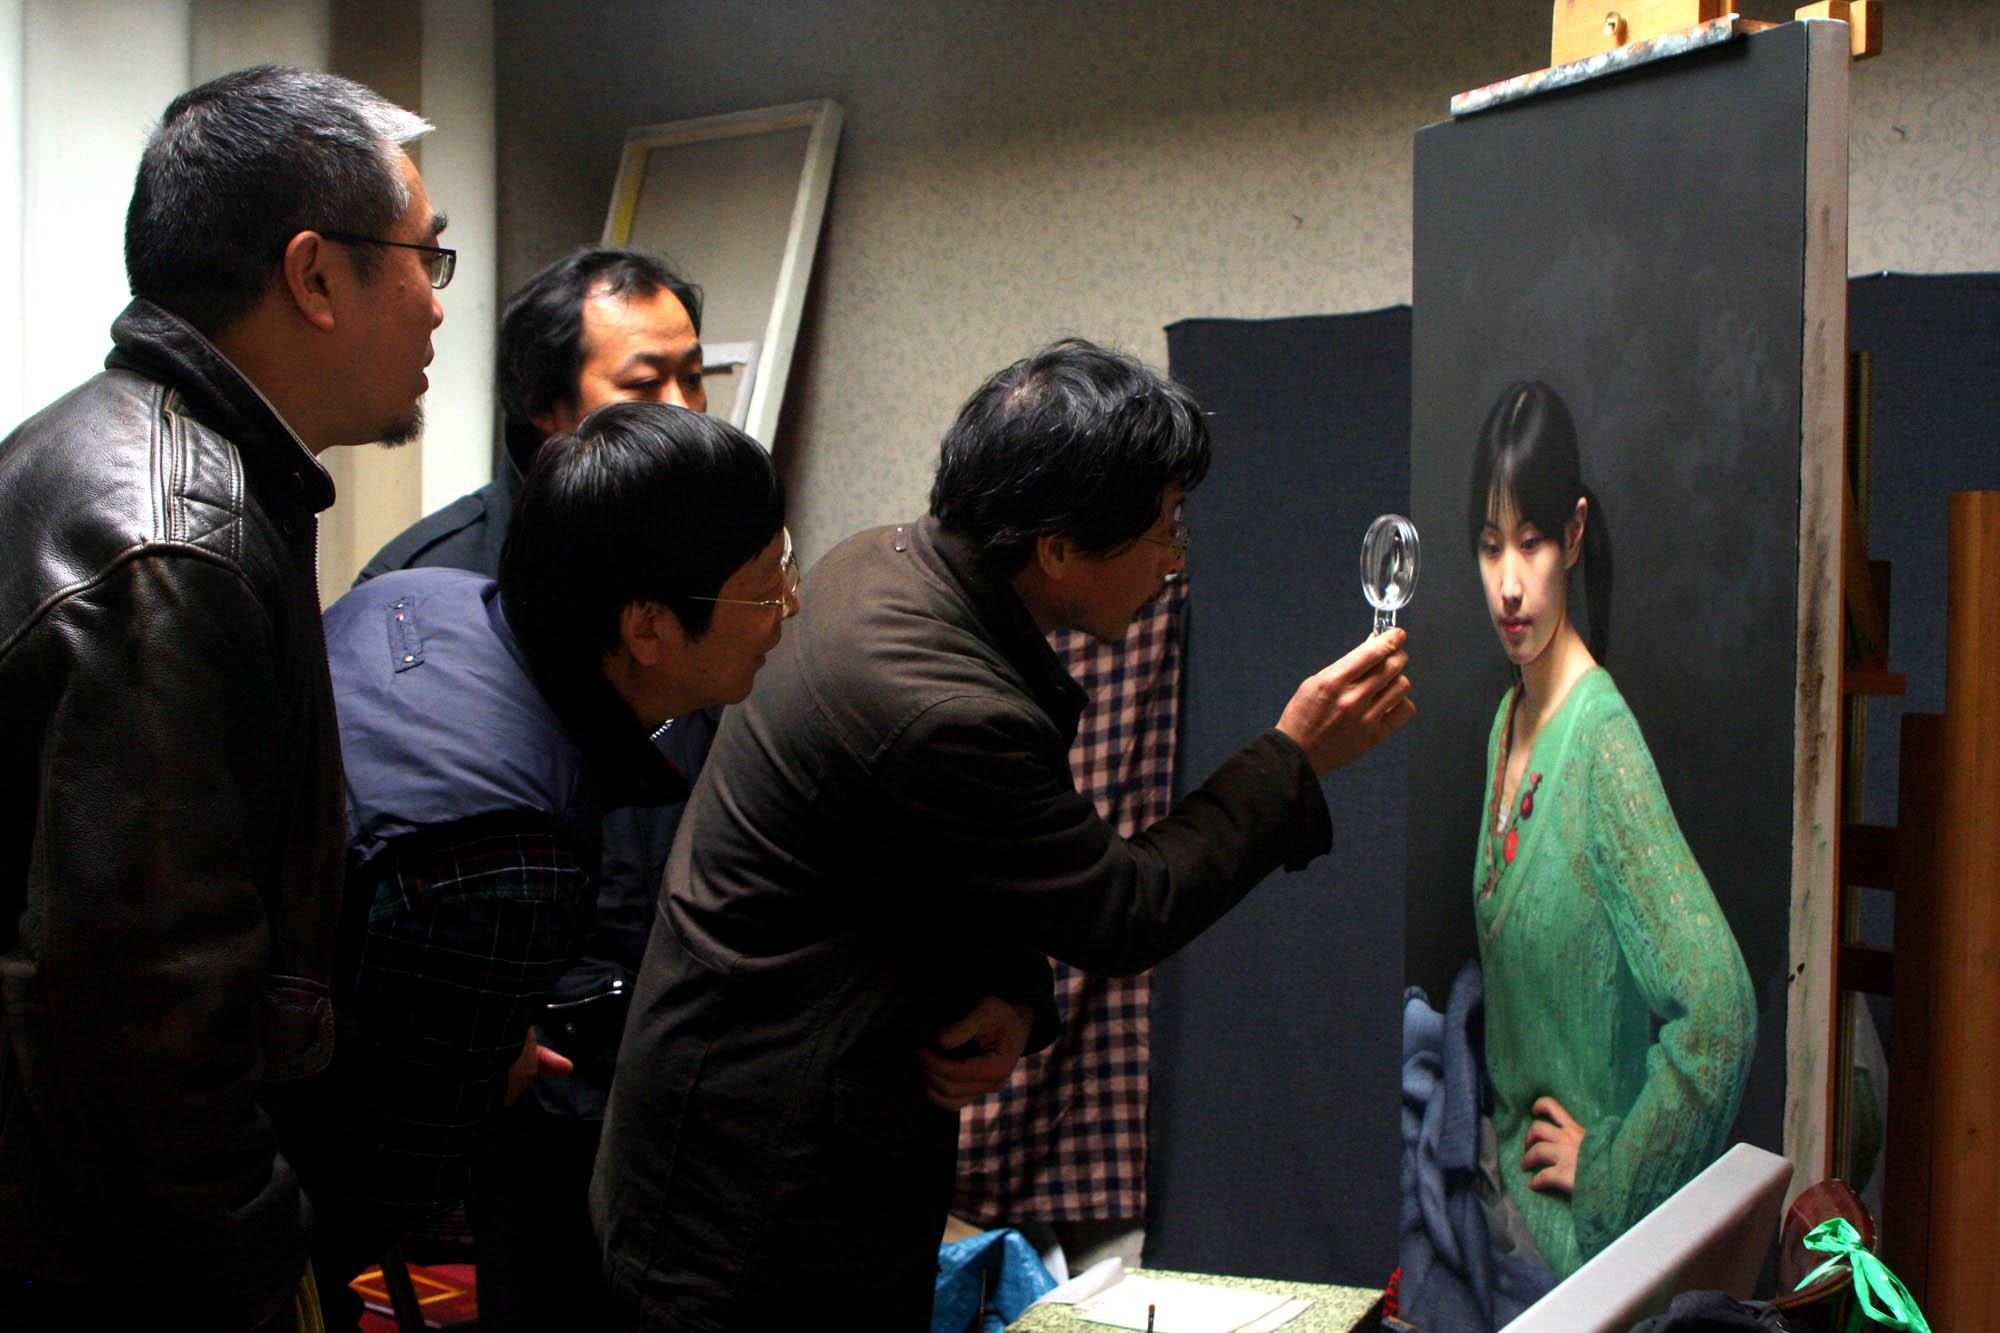 Details of Leng Jun